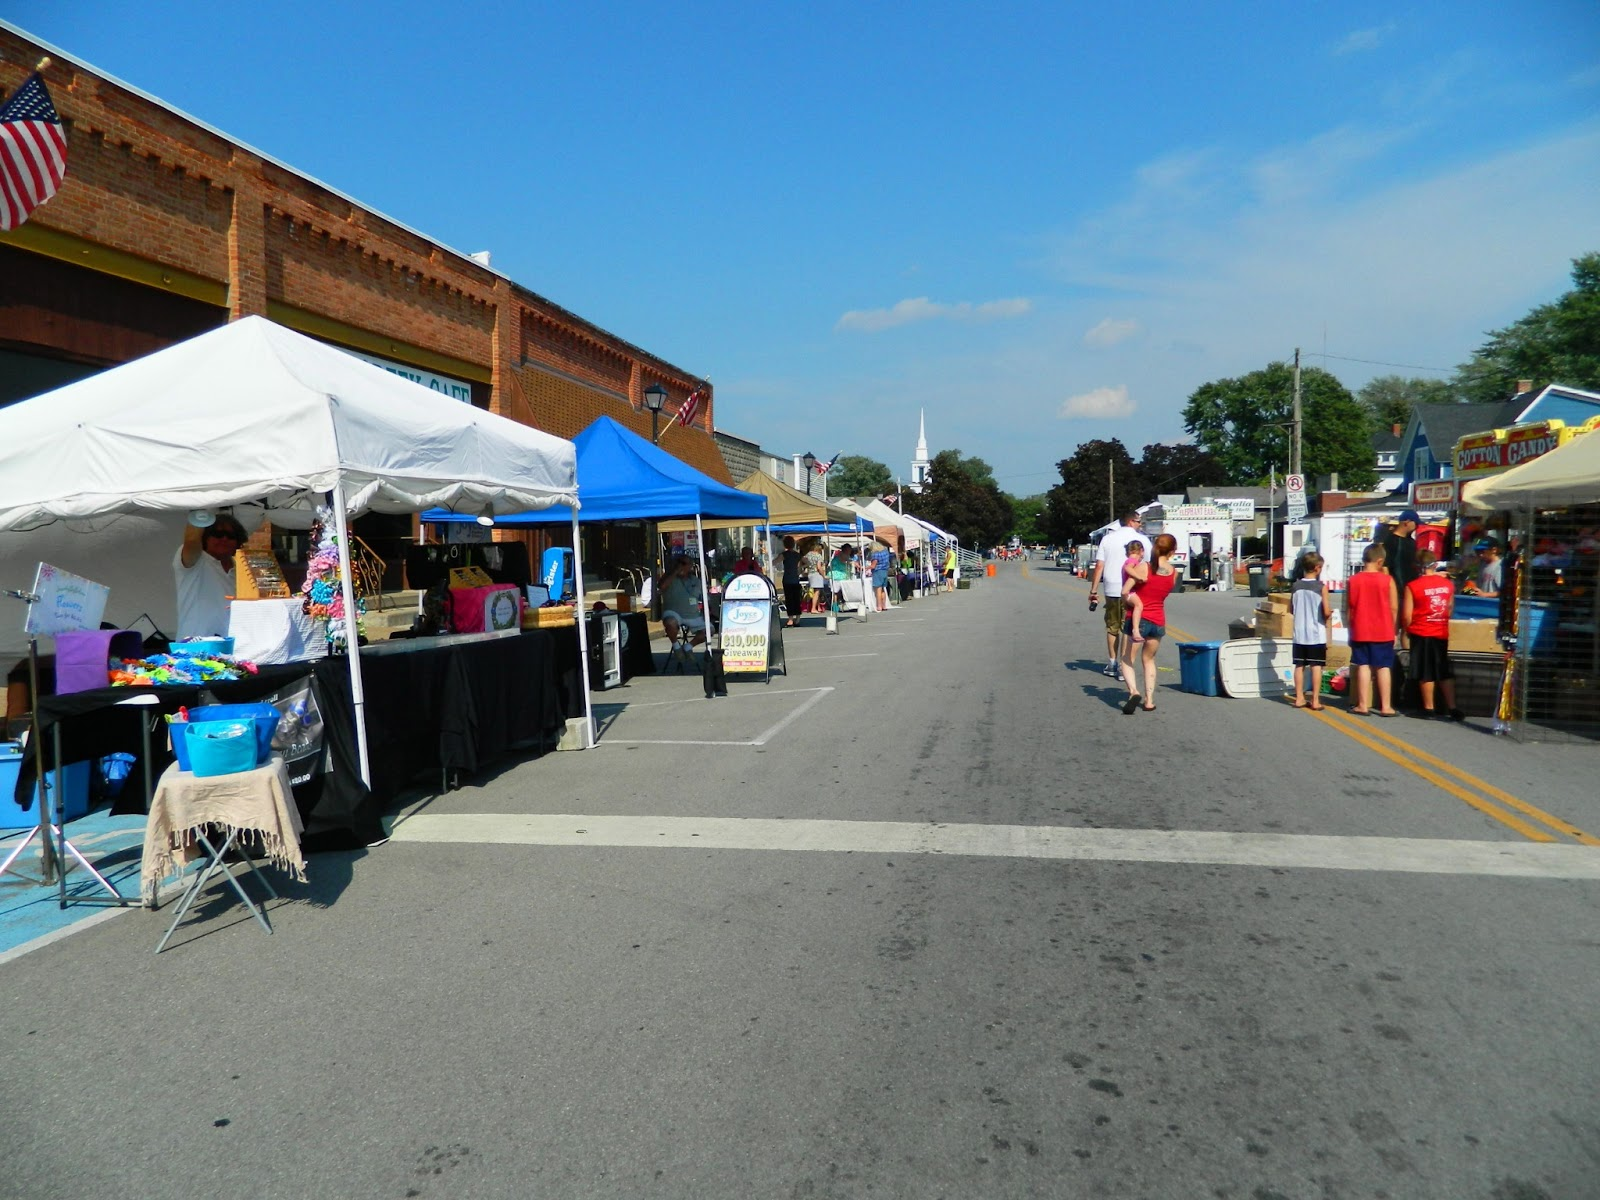 18.) Castalia Cold Creek Celebration July 19, 2013 | Ohio Festivalscastalia town